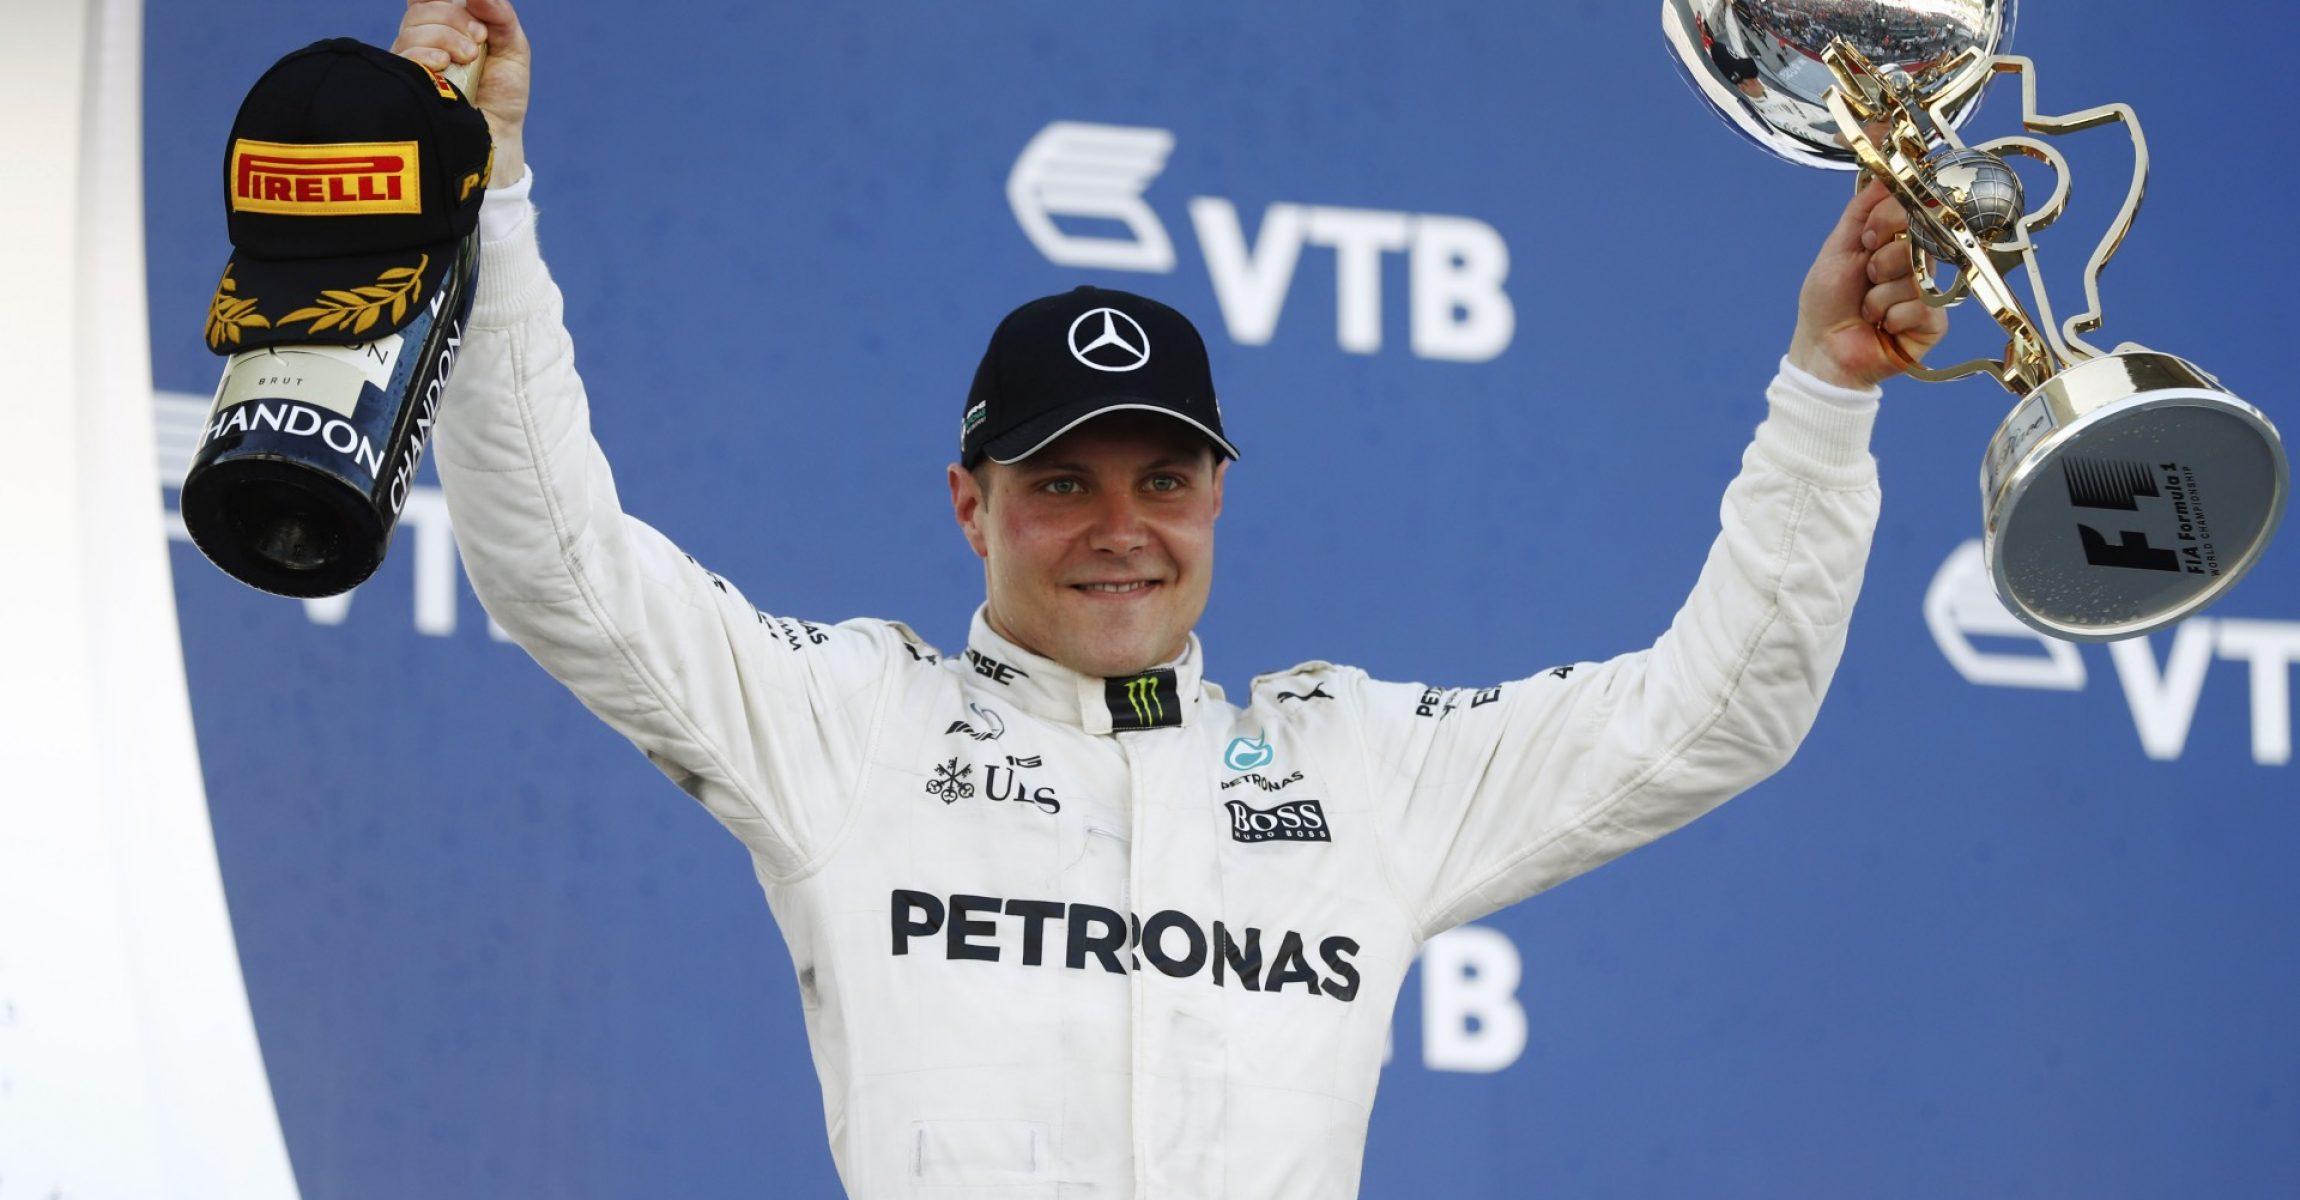 Fotó: Russian GP